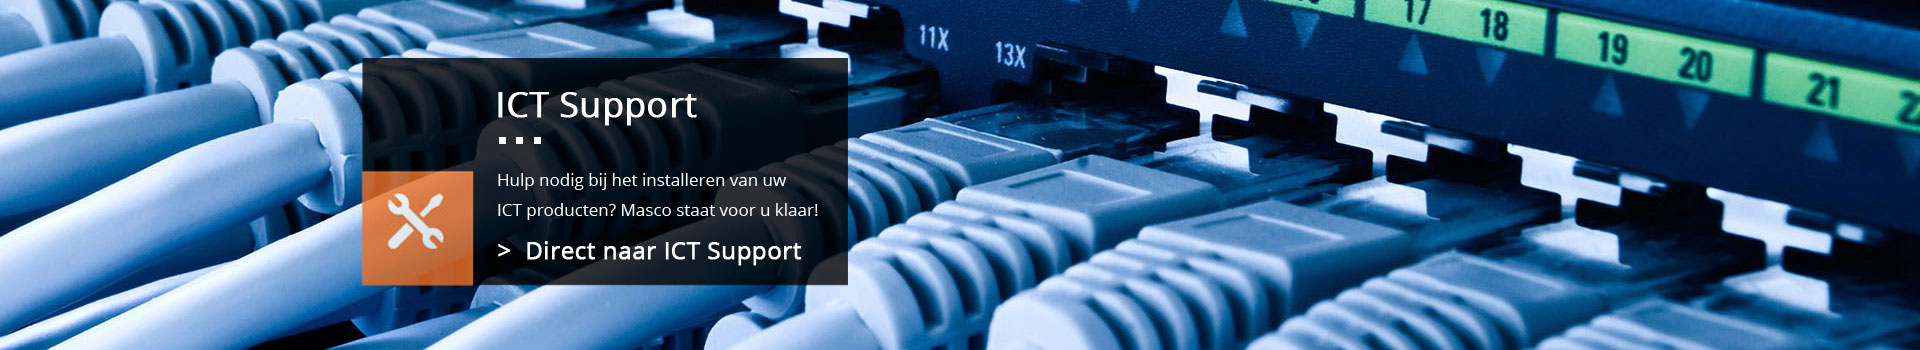 Mascosite - ICT Support - Mainbanner 1